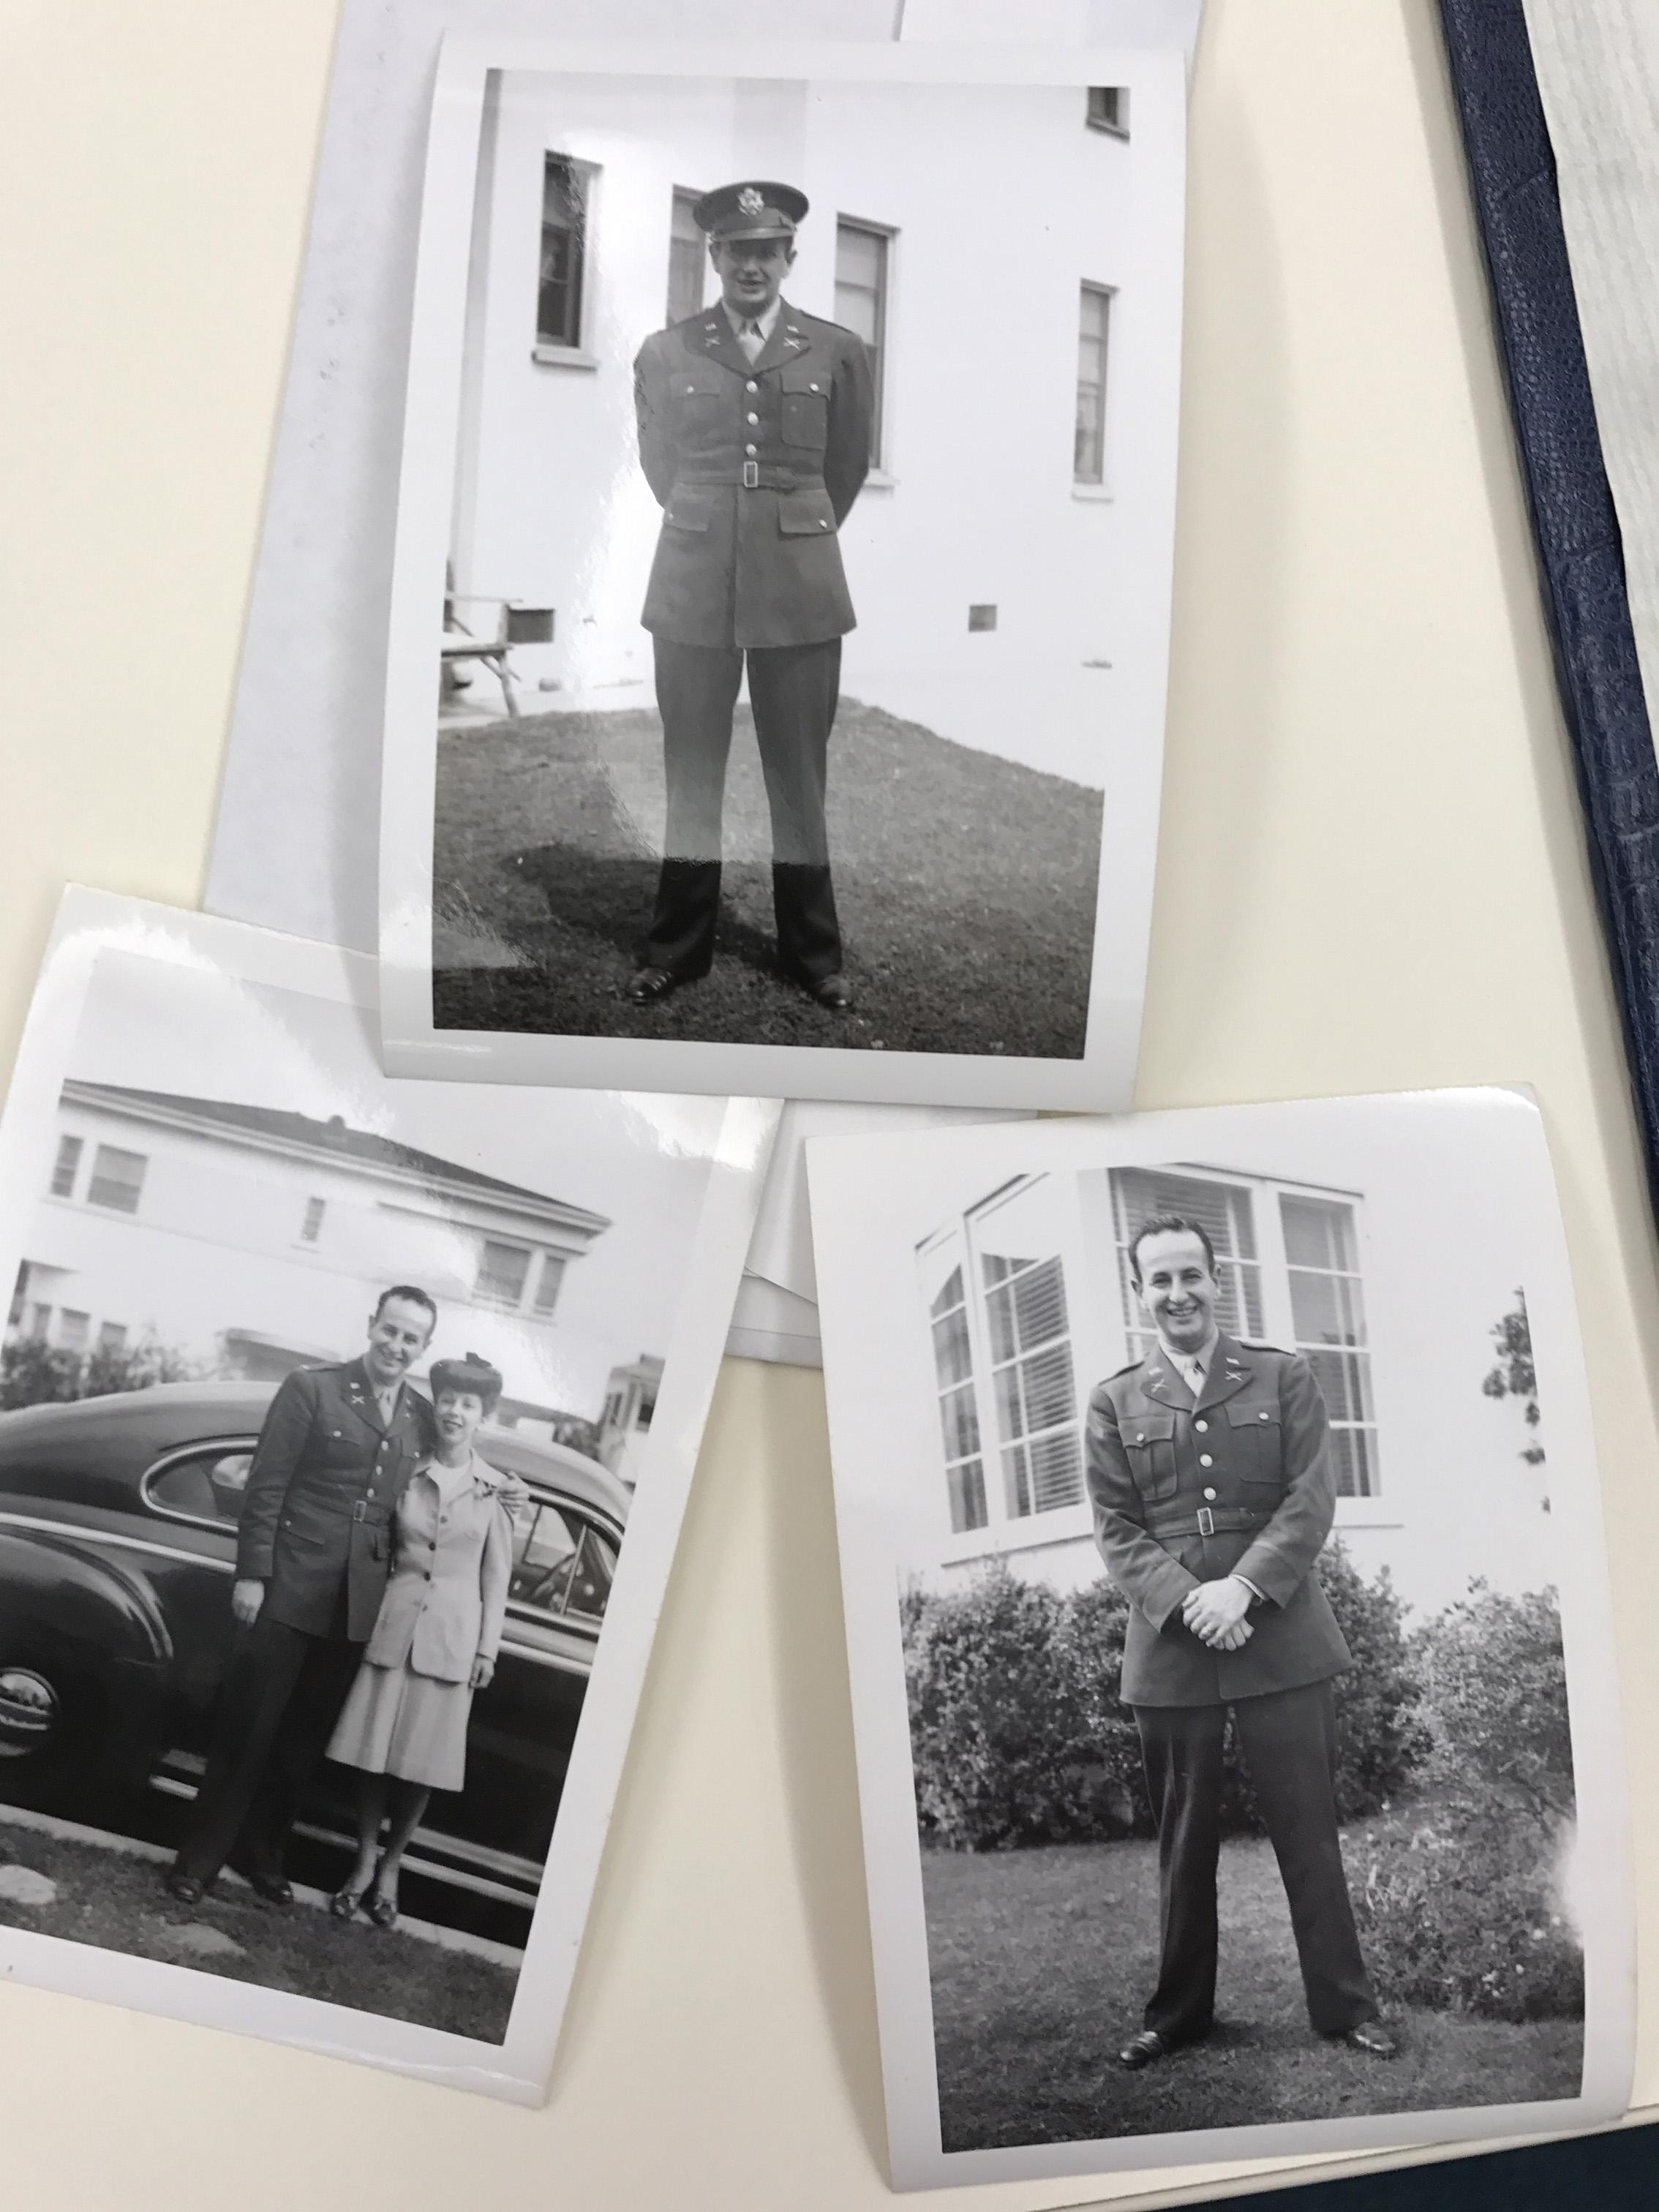 Photos of Lt. Harry K. Wolff, Jr.